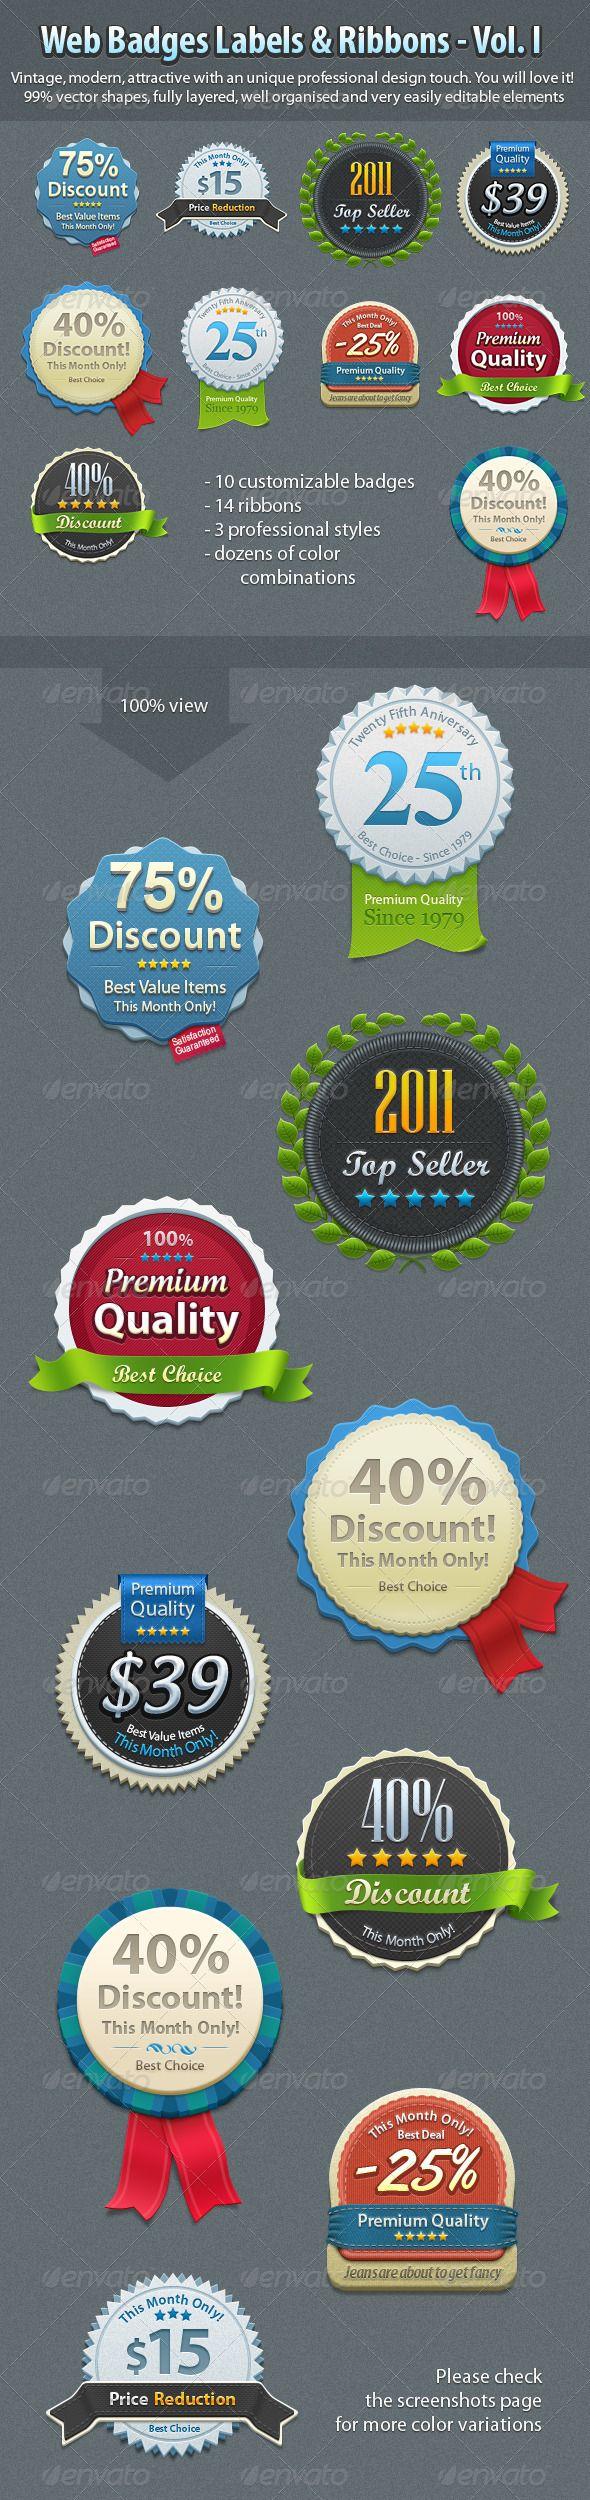 Badges Vol. 1 - GraphicRiver Item for Sale